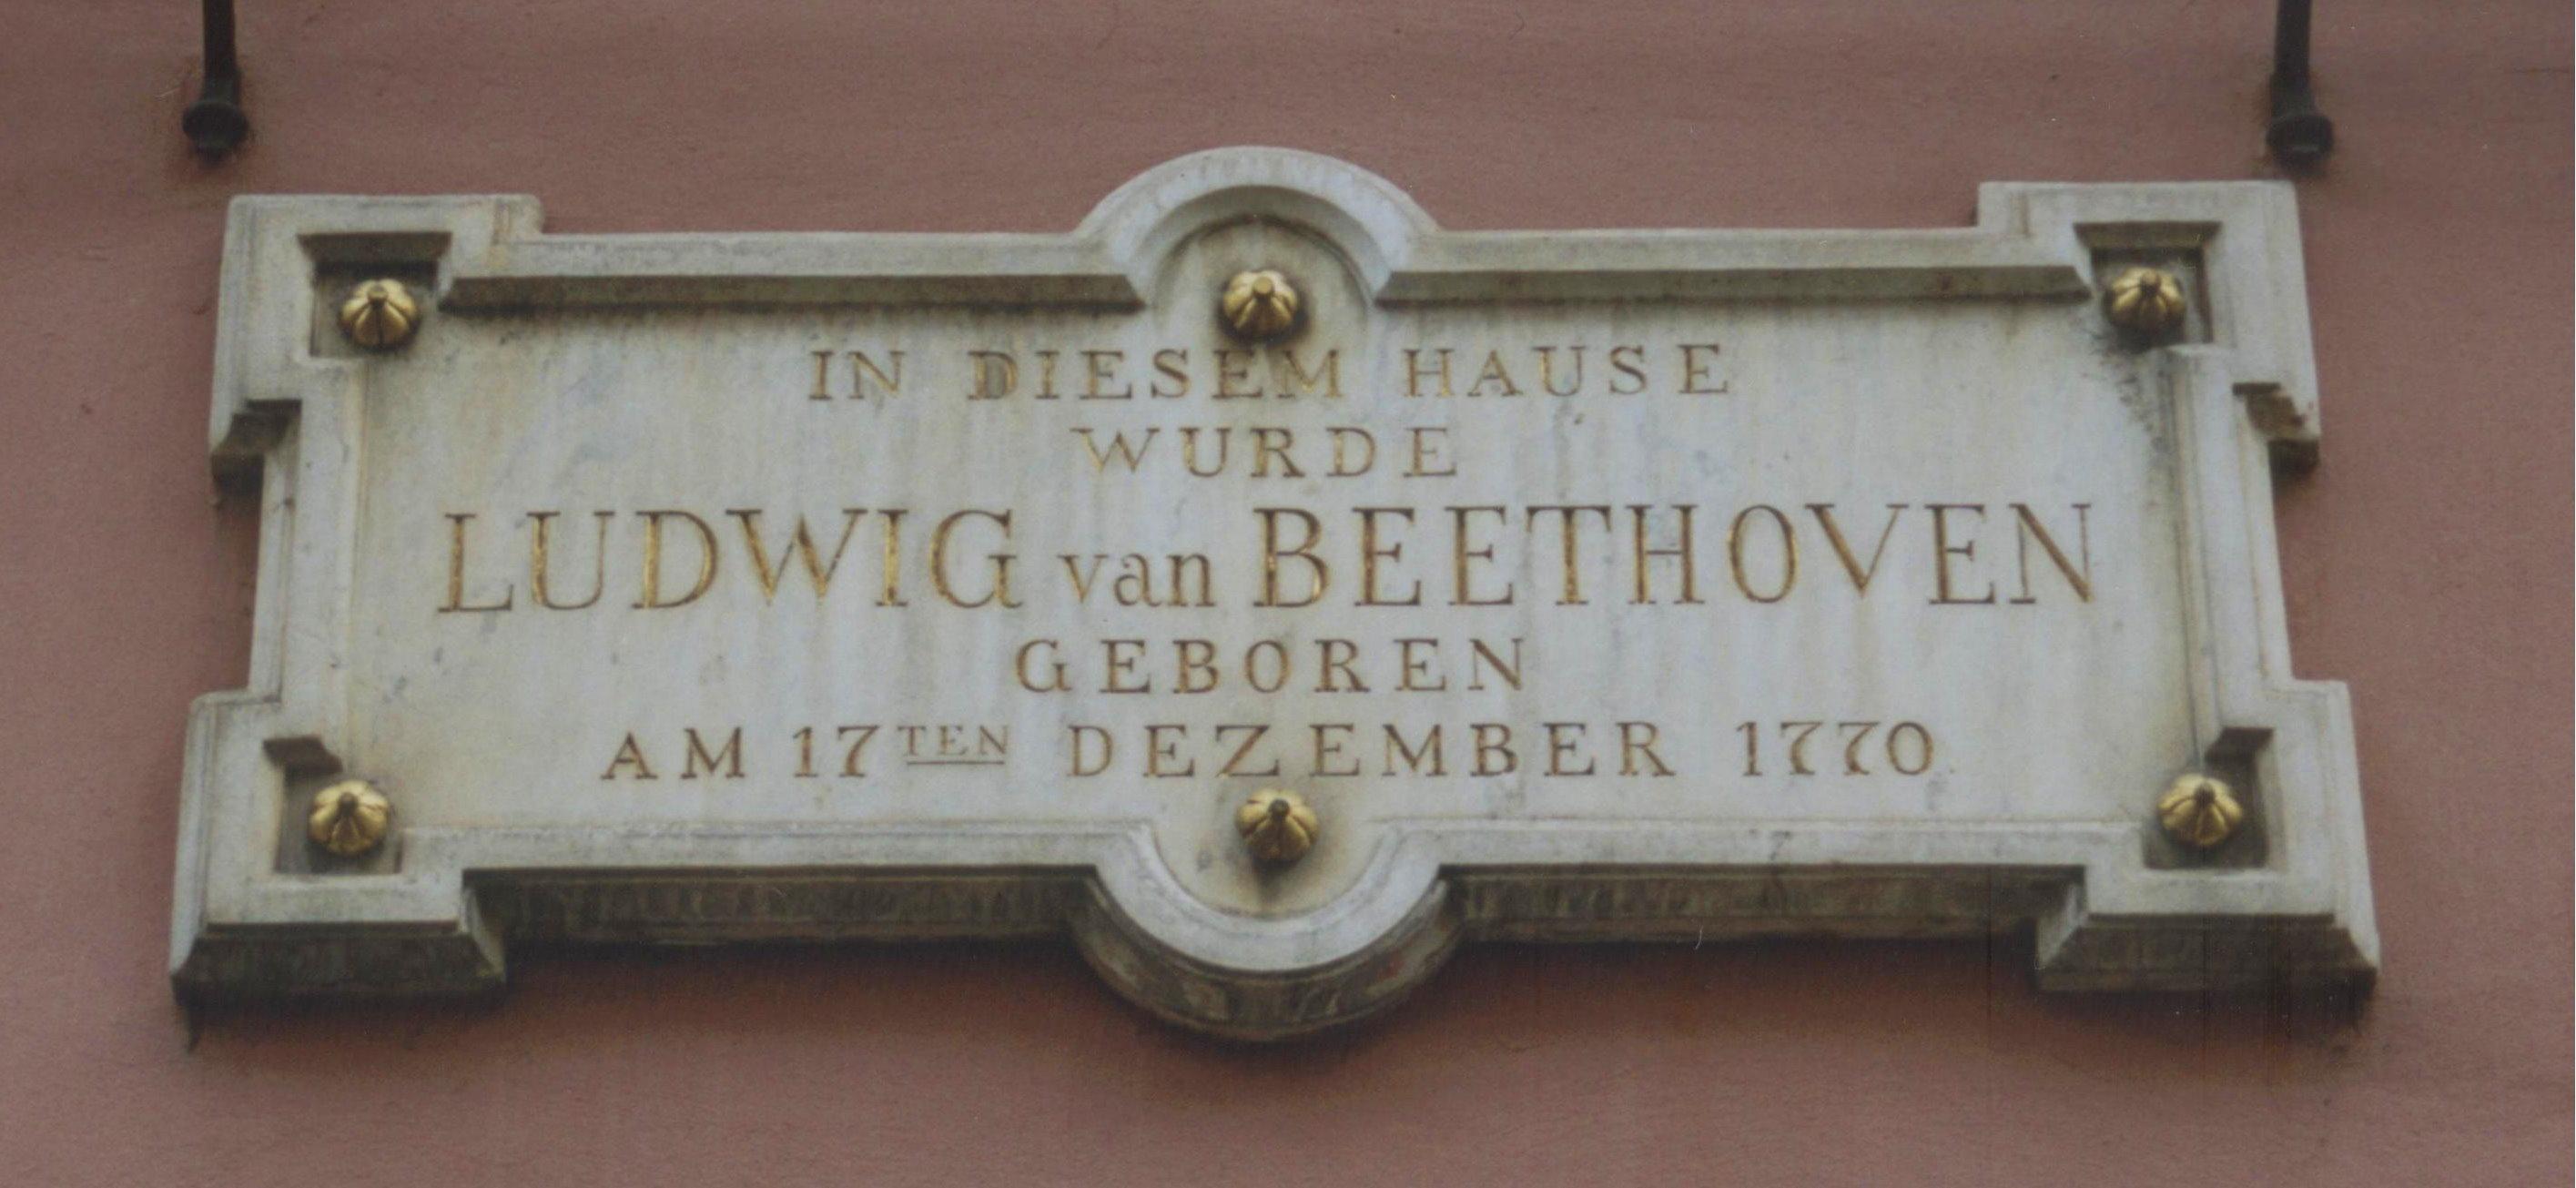 Ludwig Van Beethoven* Beethoven·, Frédéric Chopin* Chopin·, Claude Debussy* Debussy·, Edvard Grieg* Grieg·, Robert Schumann* Schumann·, Fernando Sor* Sor·, Laurindo Almeida - From The Romantic Era